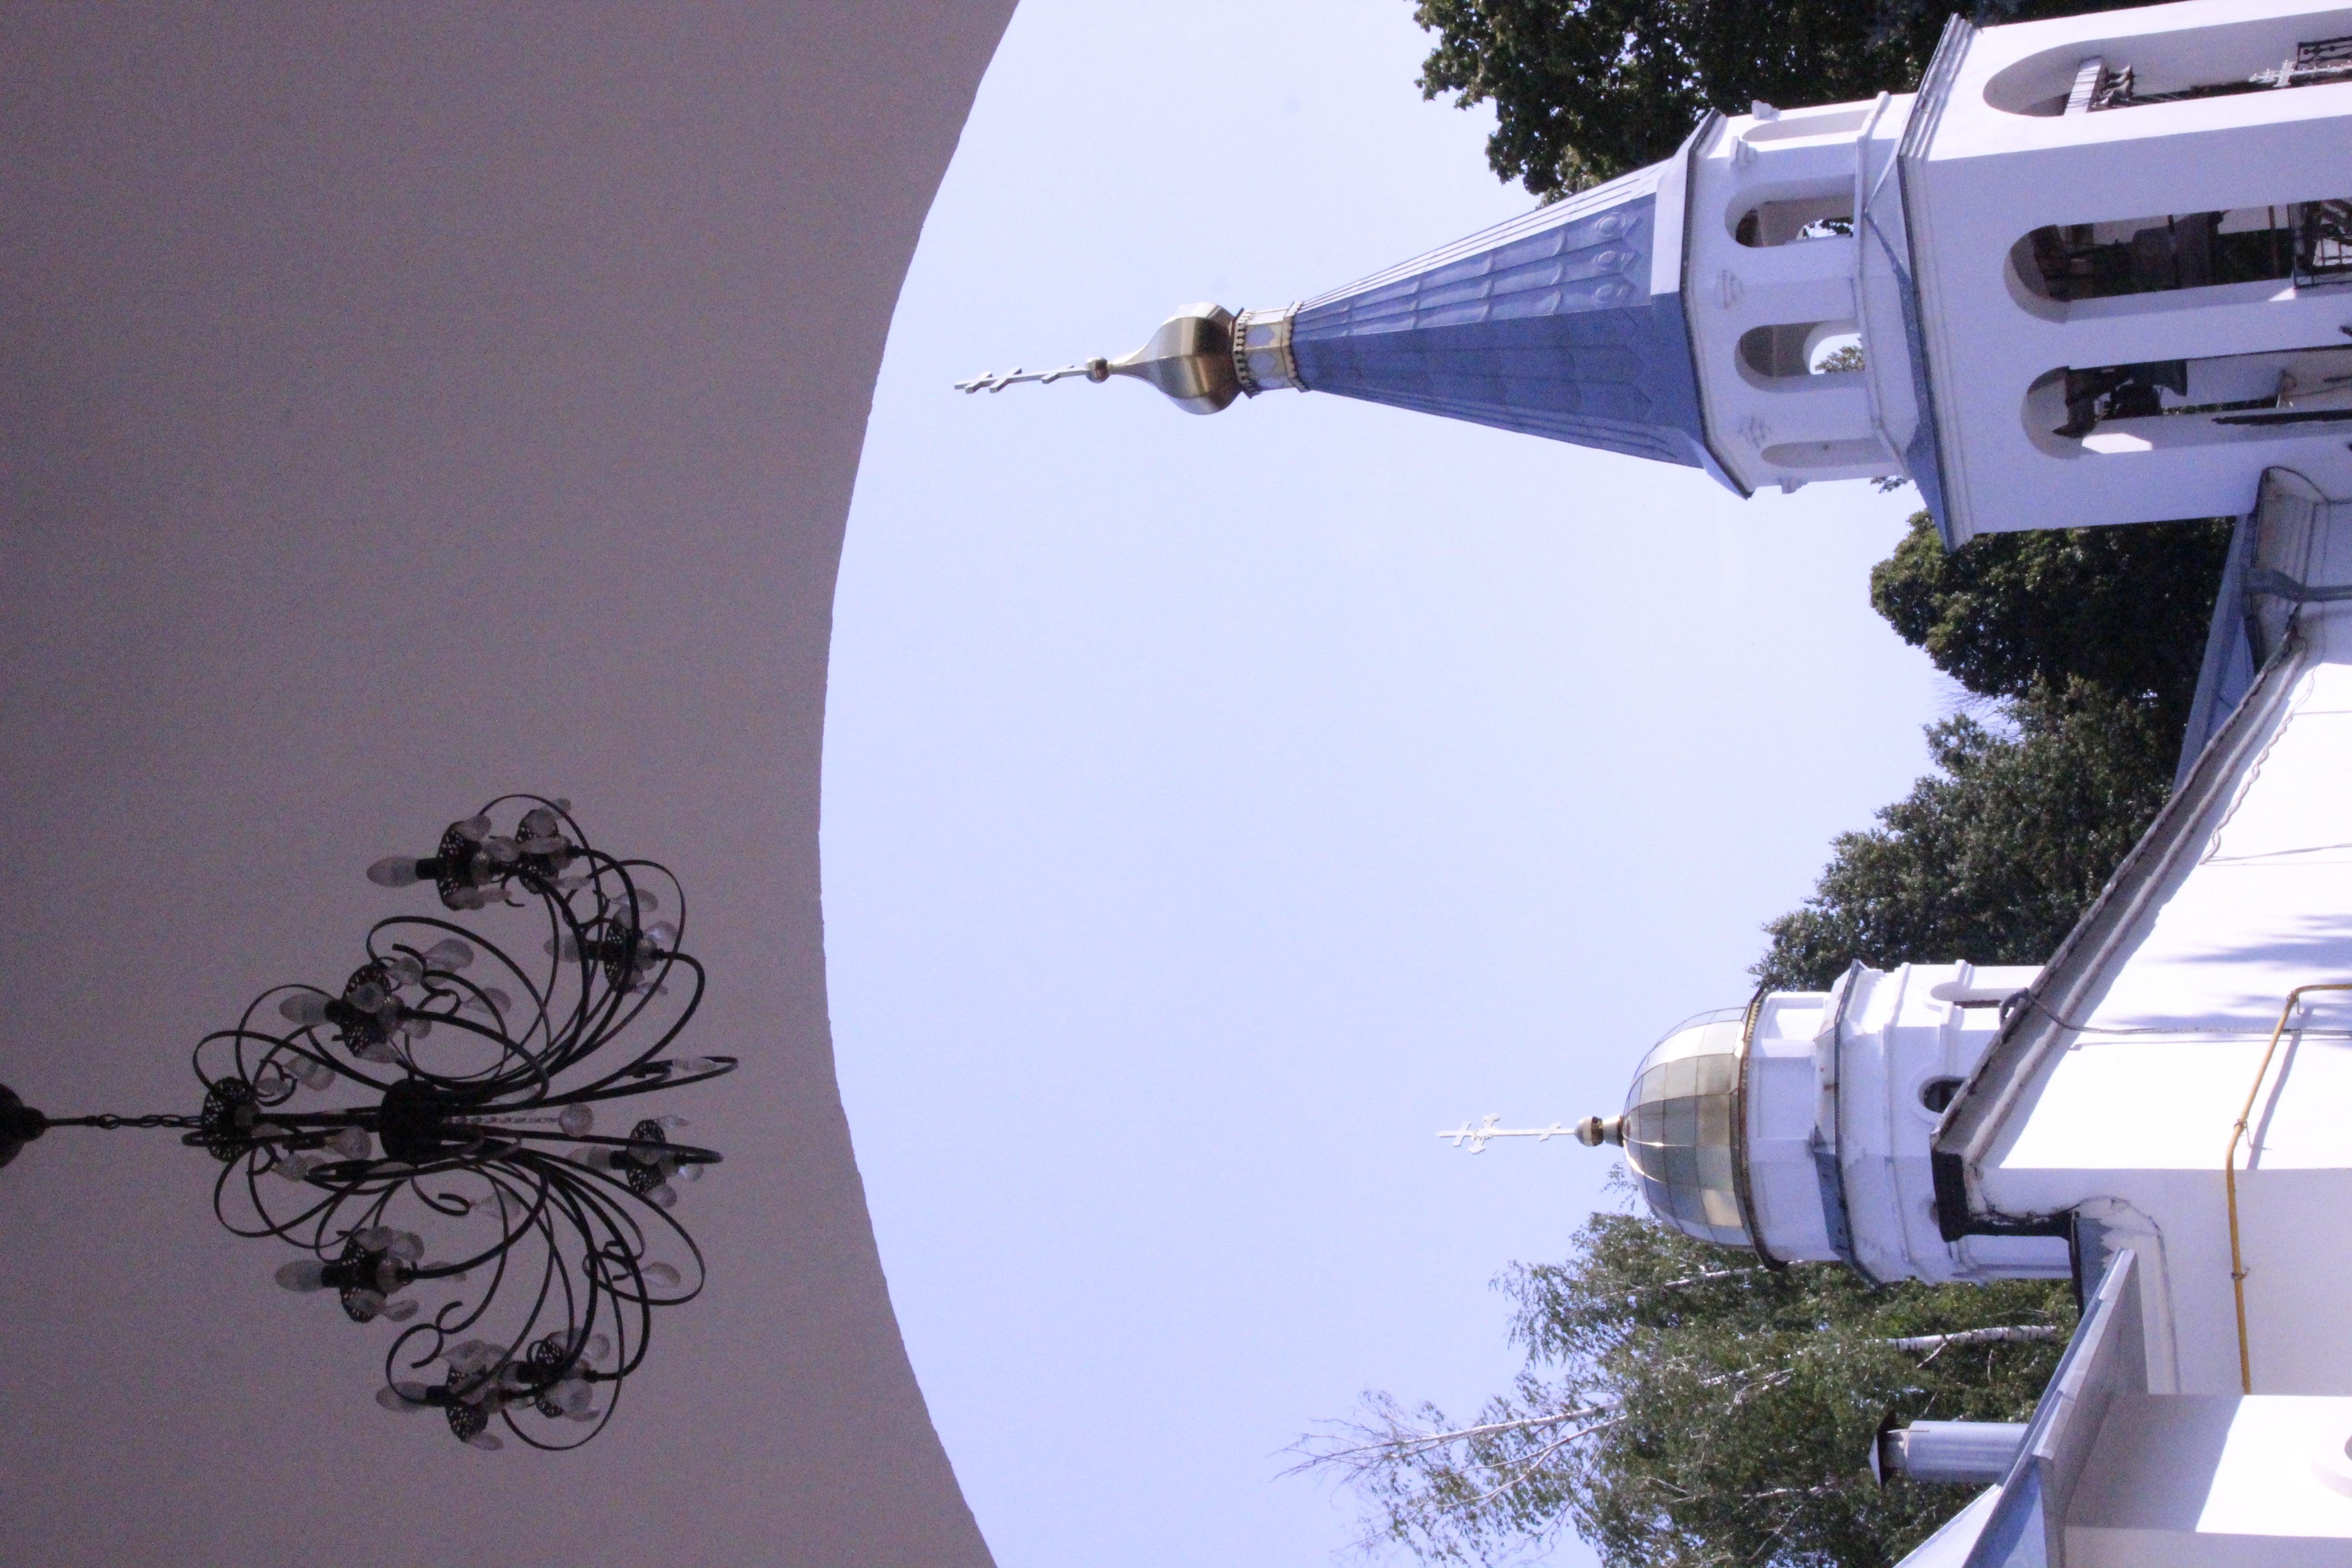 http://monuspen.ru/photoreports/f4fa0e4852806963b5d2157d9dc53b52.JPG